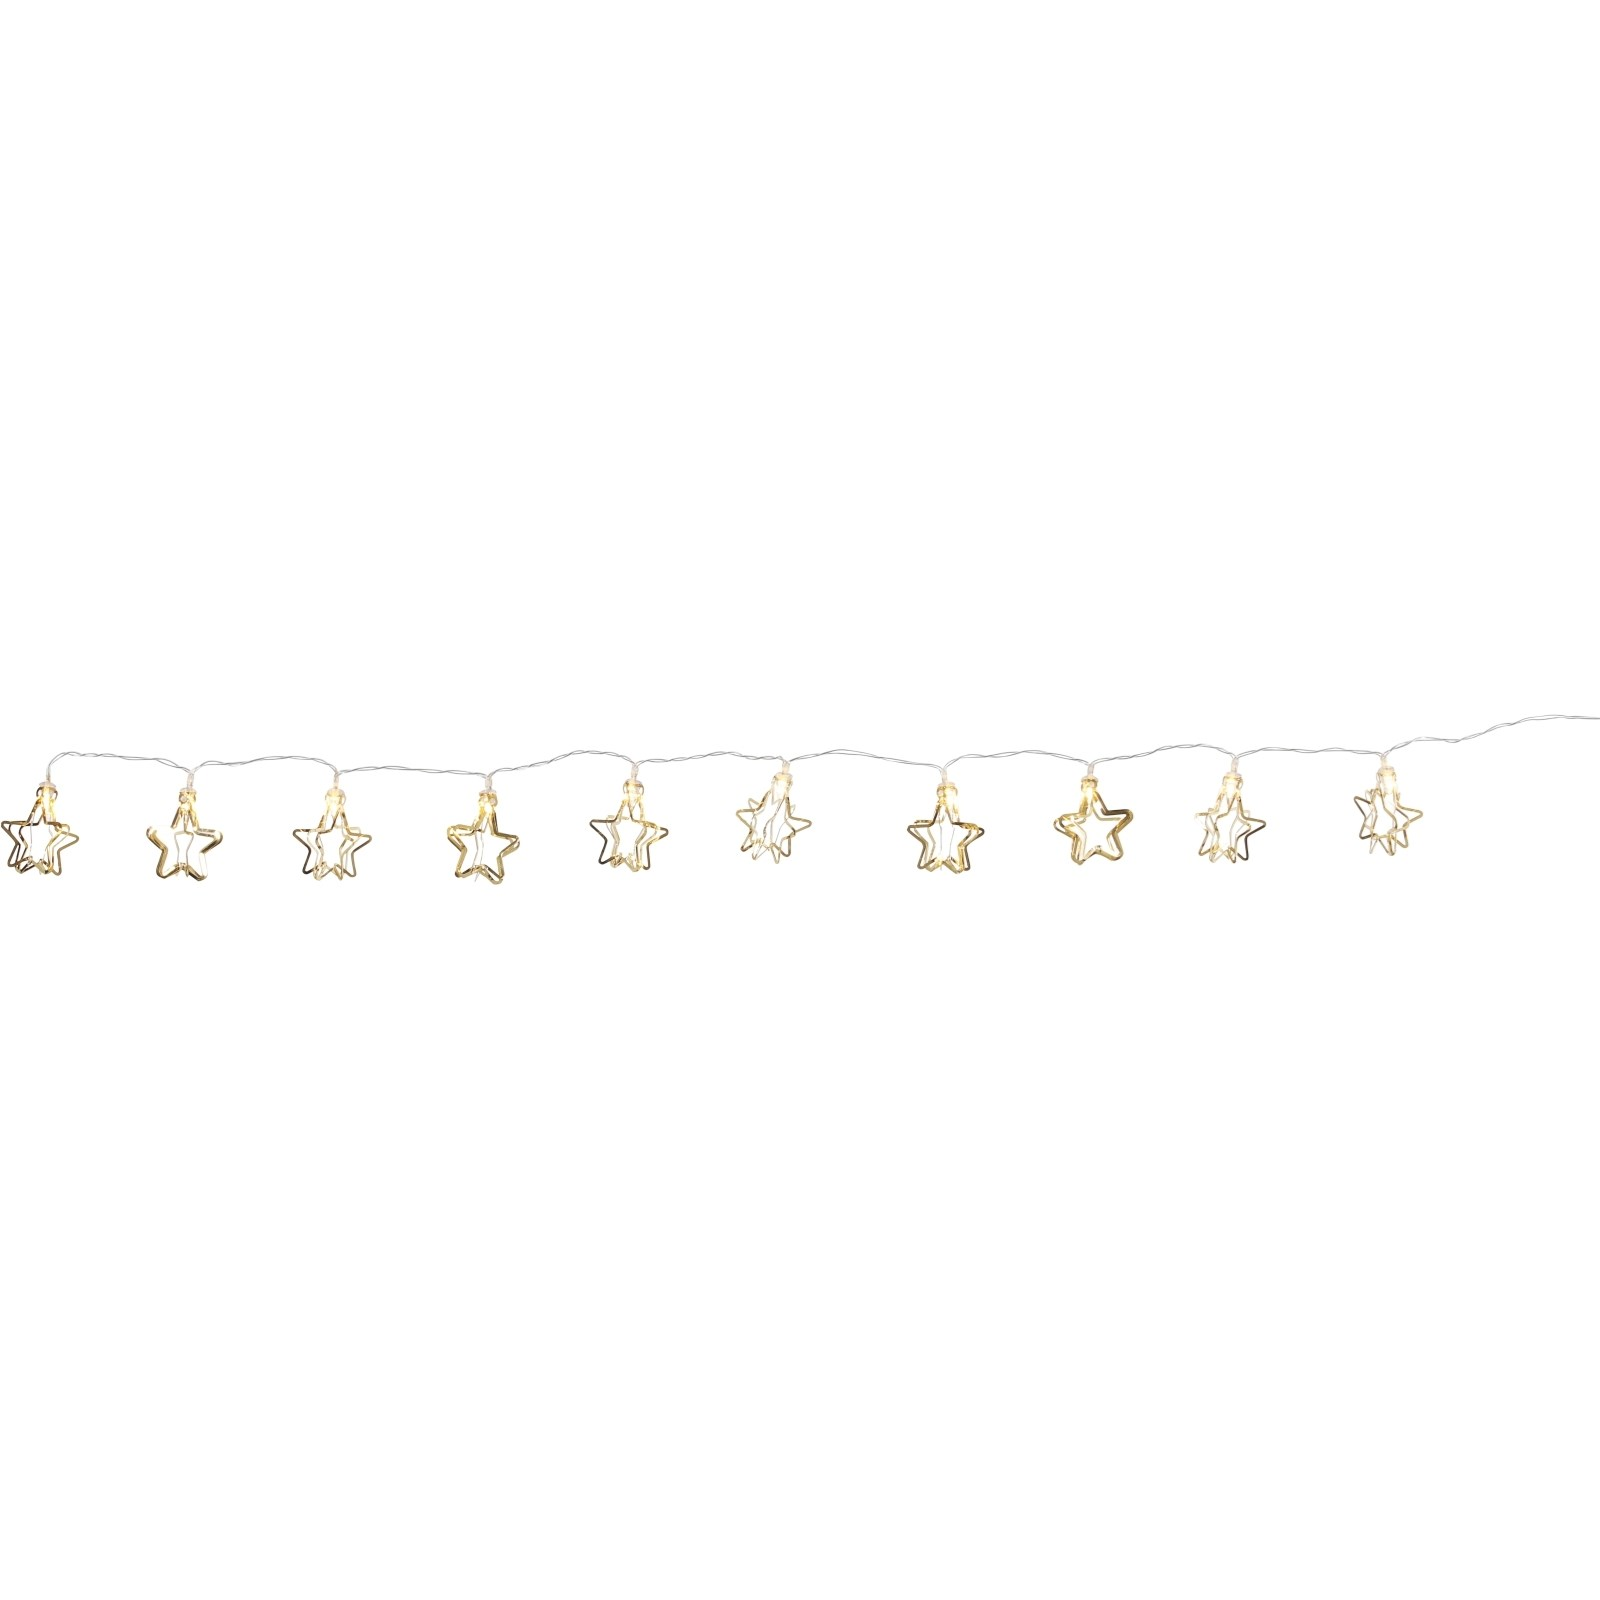 3d Weihnachtsbeleuchtung.Lichterkette Sterne Gold 3d Weihnachtsbeleuchtung Landi